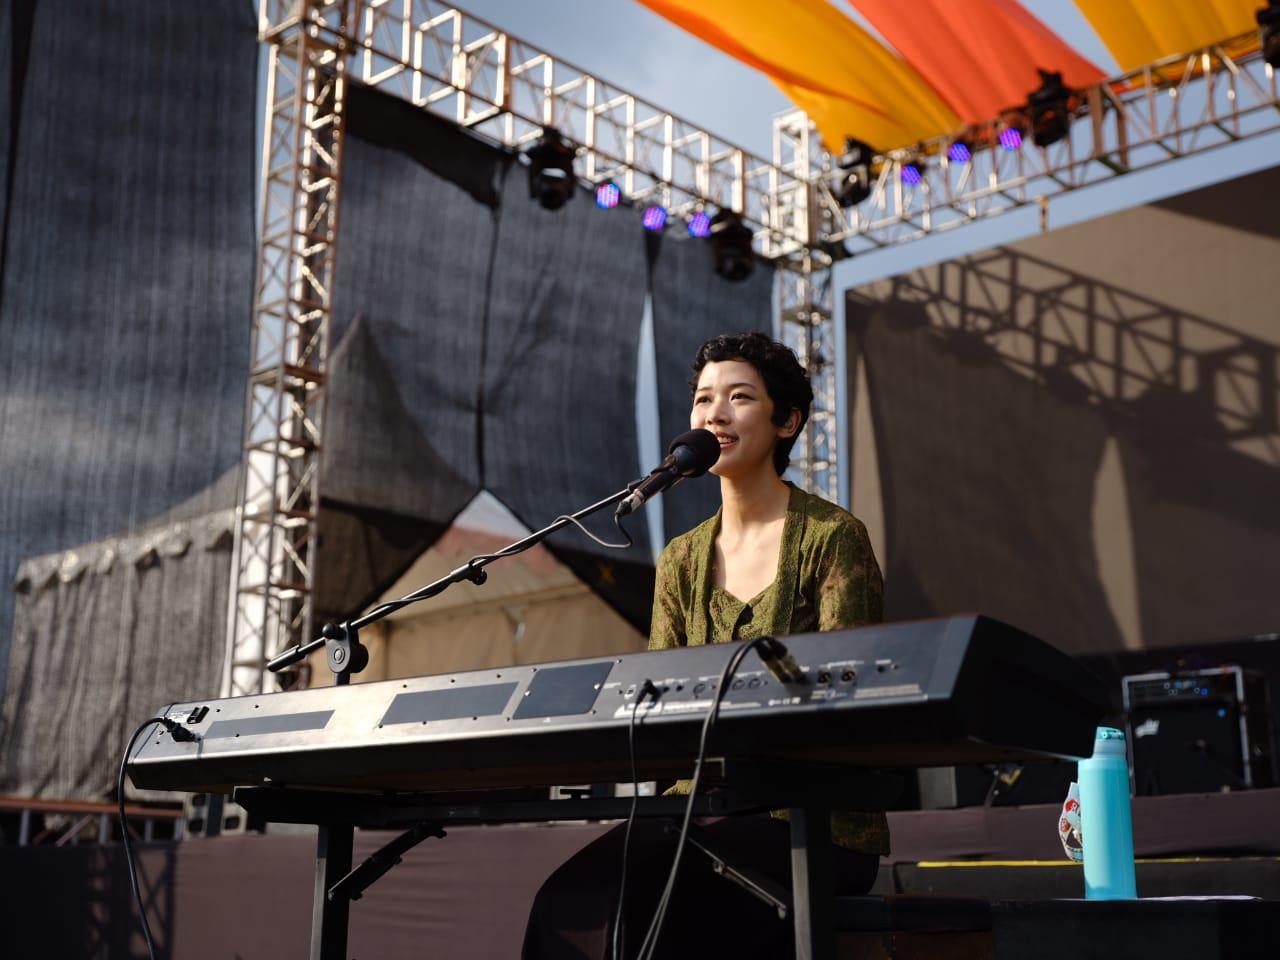 Frau Tampil Perdana di Balkonjazz Festival 2019